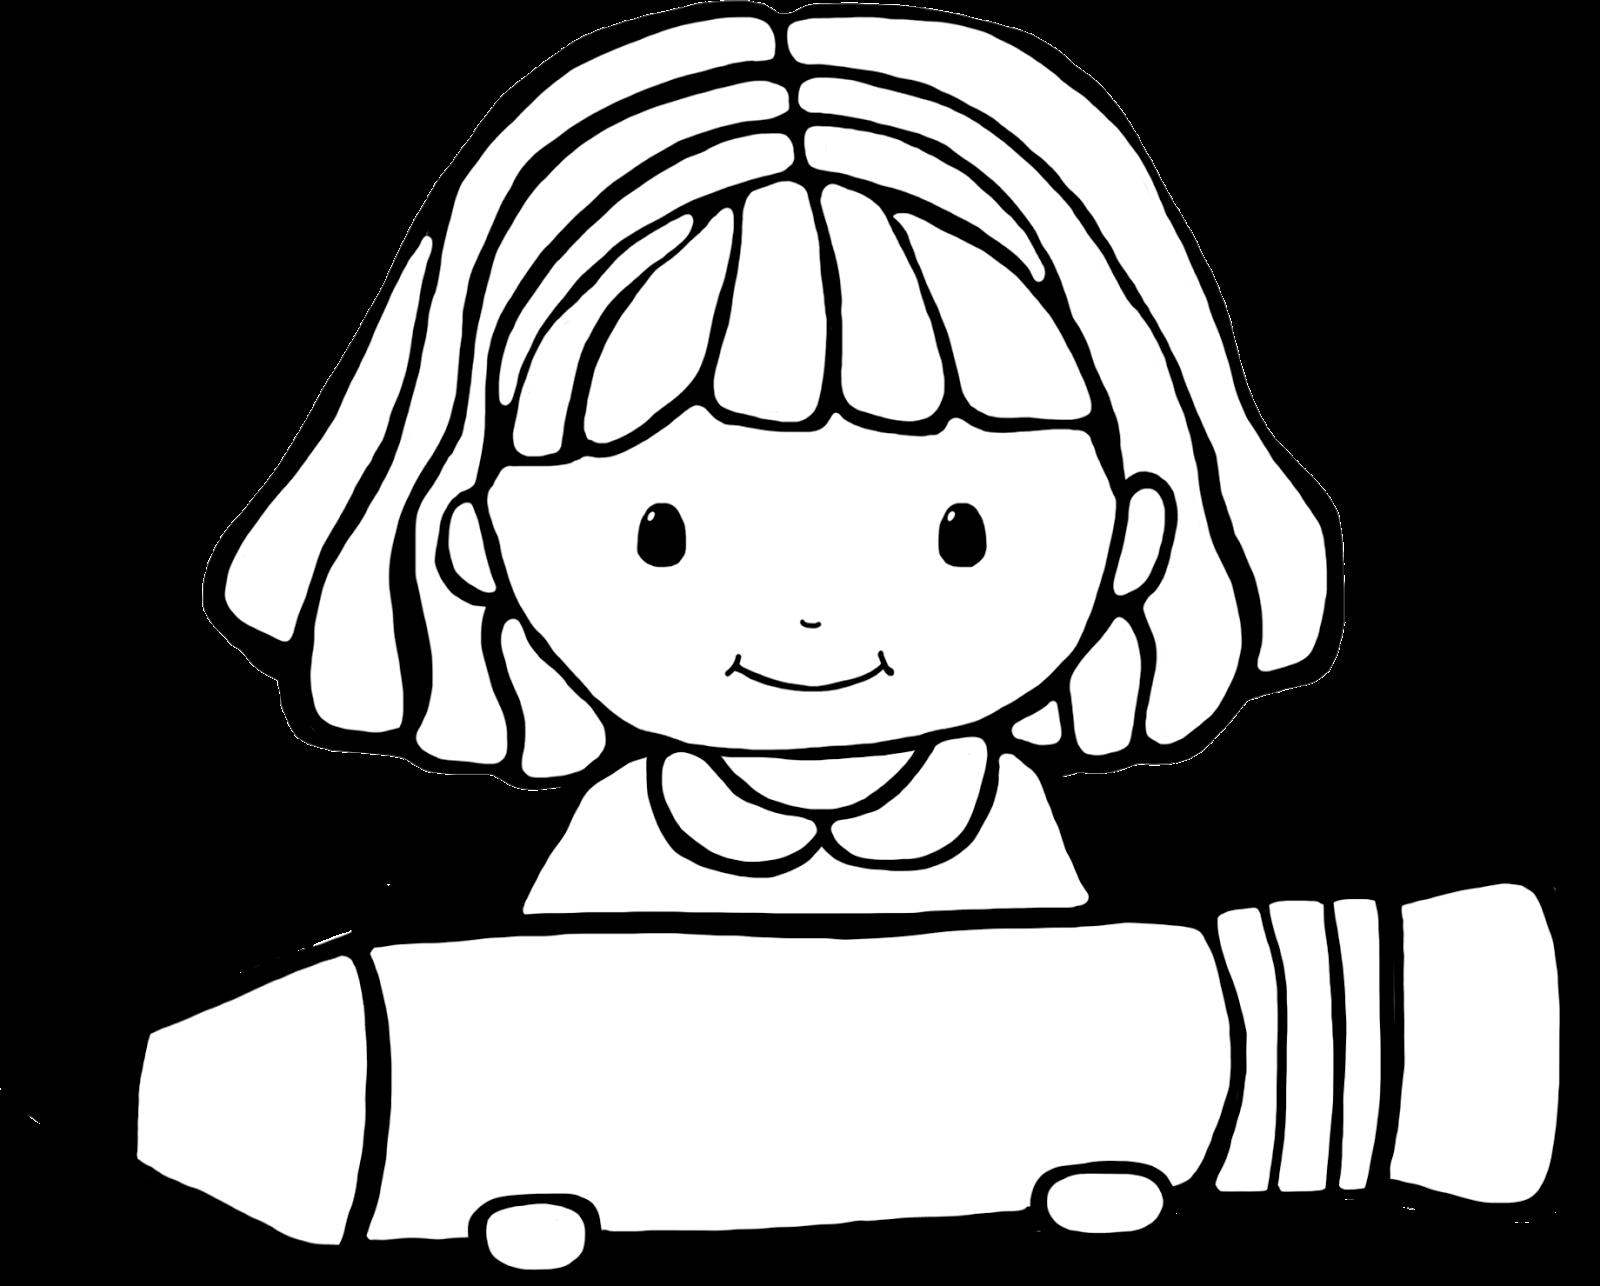 Star student clipart black and white clip art black and white download 28+ Collection of Student Working Clipart Black And White | High ... clip art black and white download